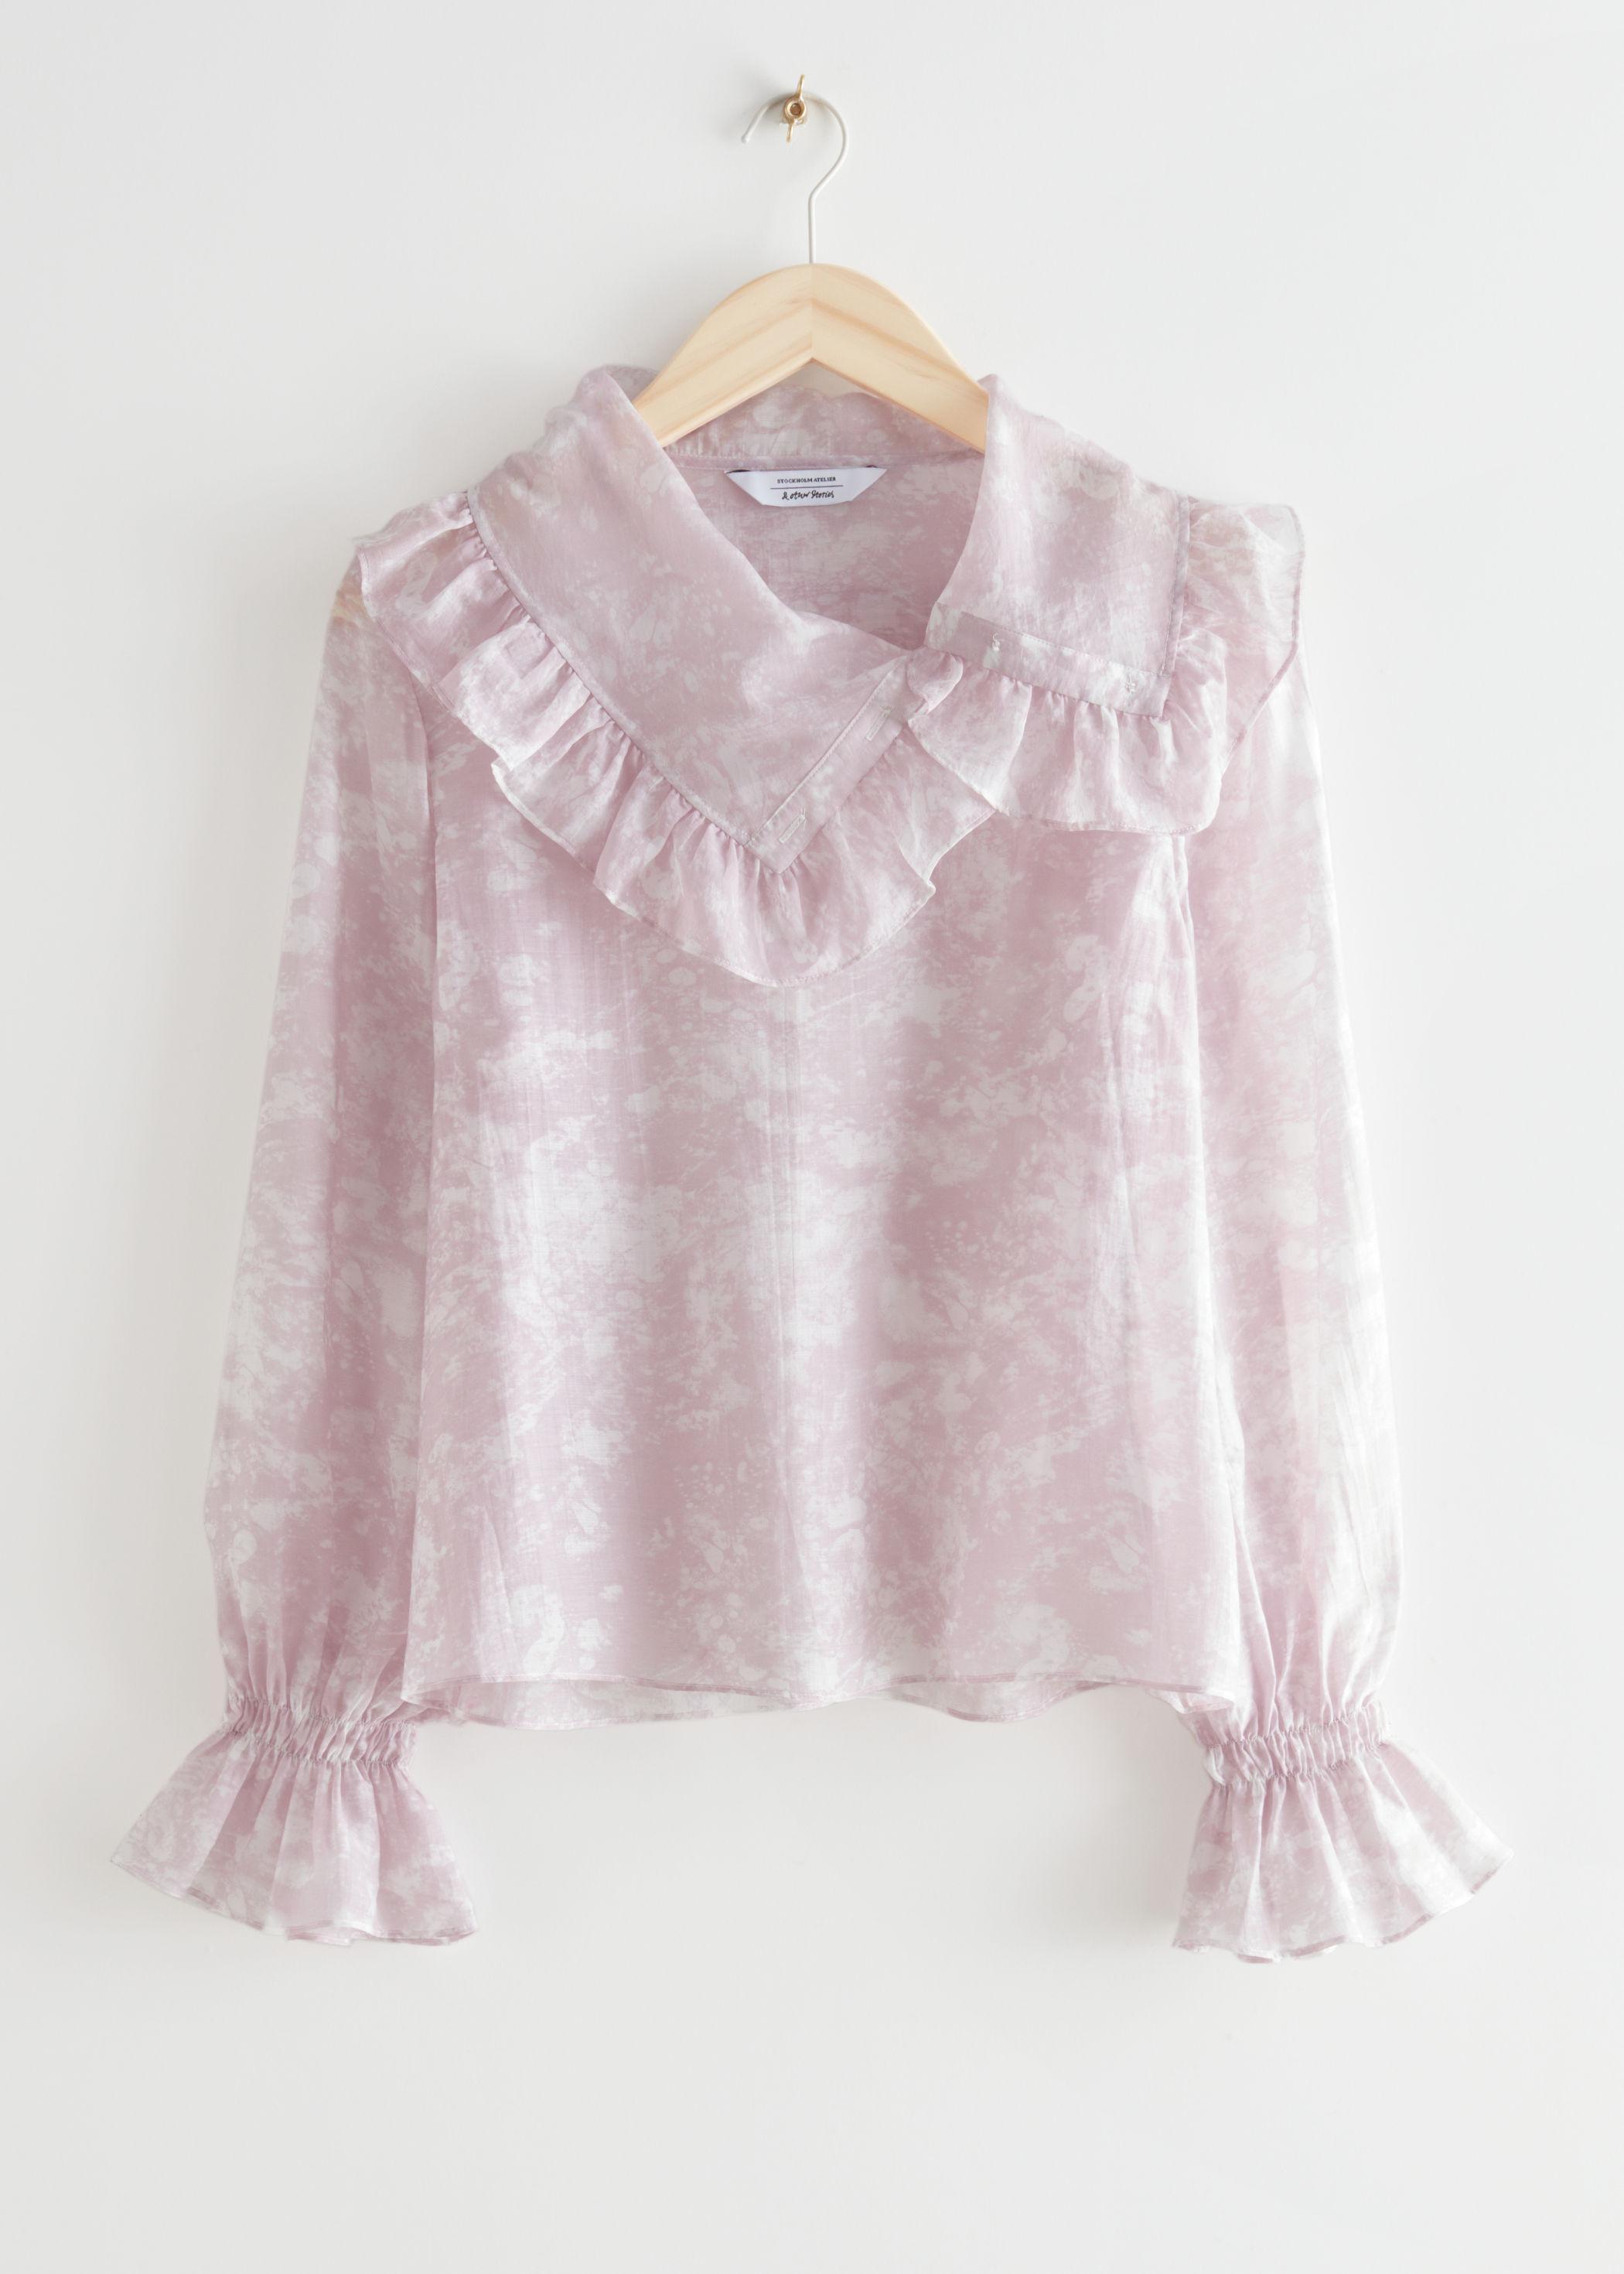 & other Stories Sheer Ruffled Shirt $89.00